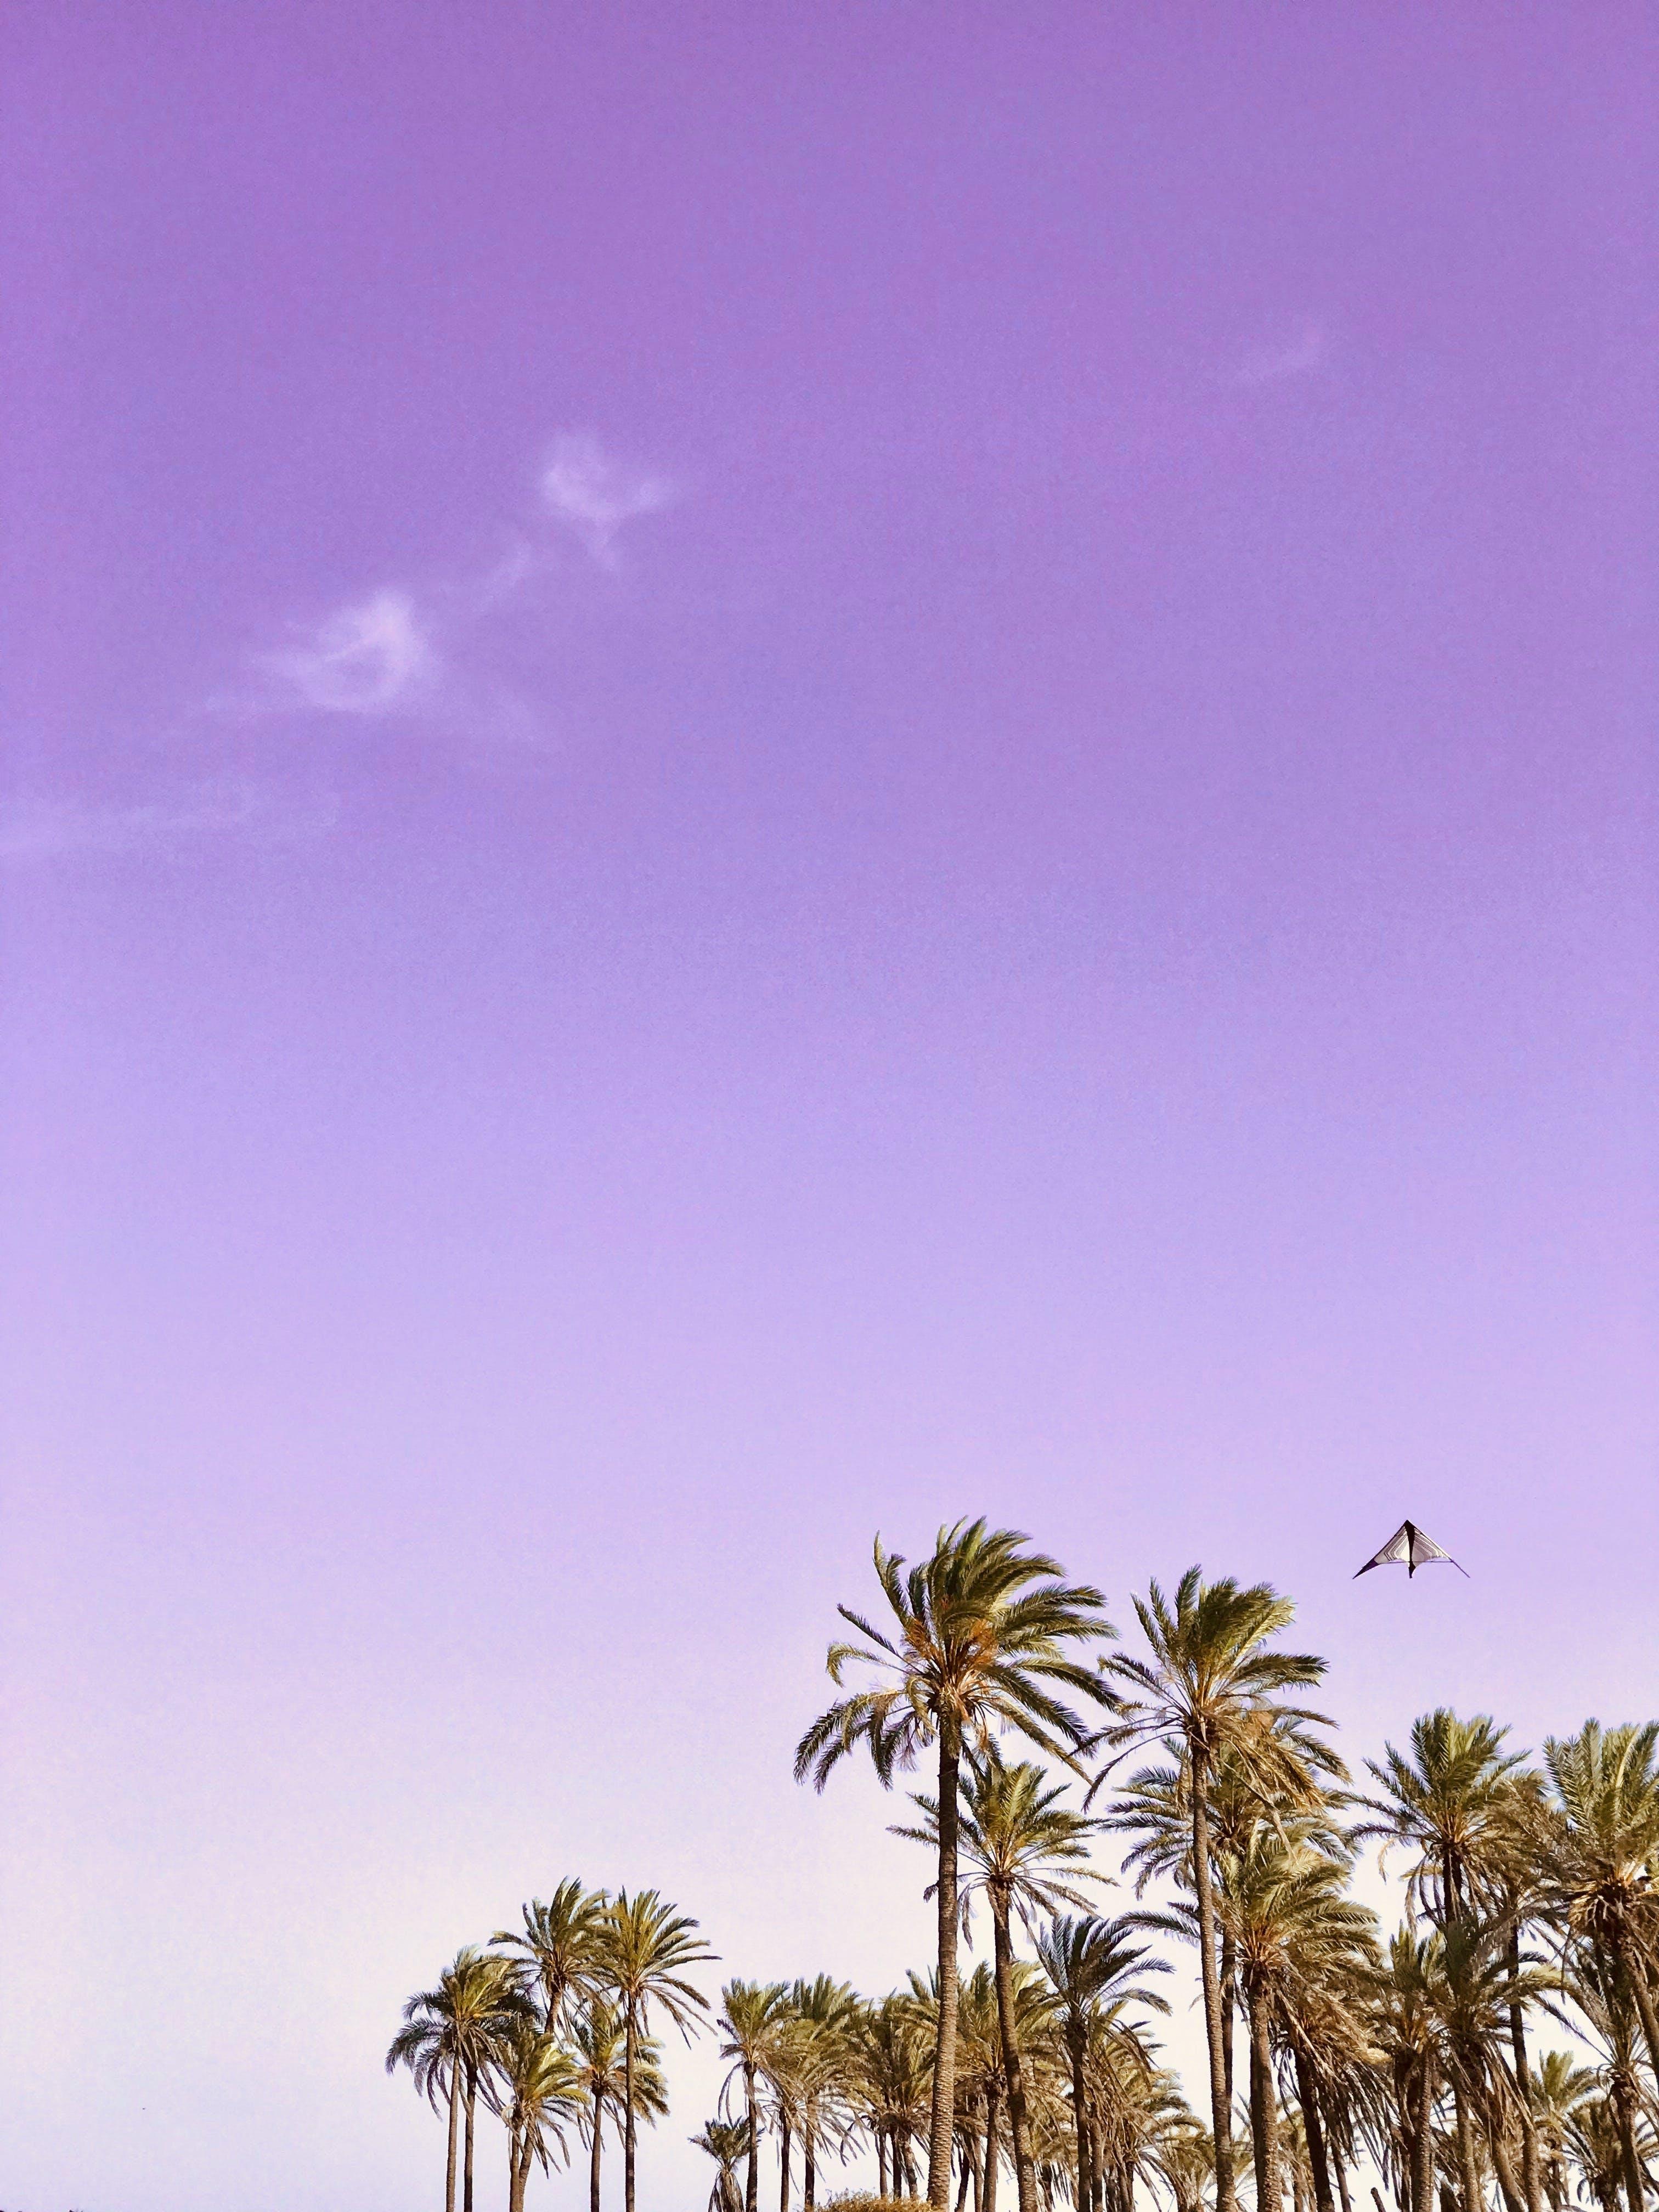 Free stock photo of kite, palms, photography, sky